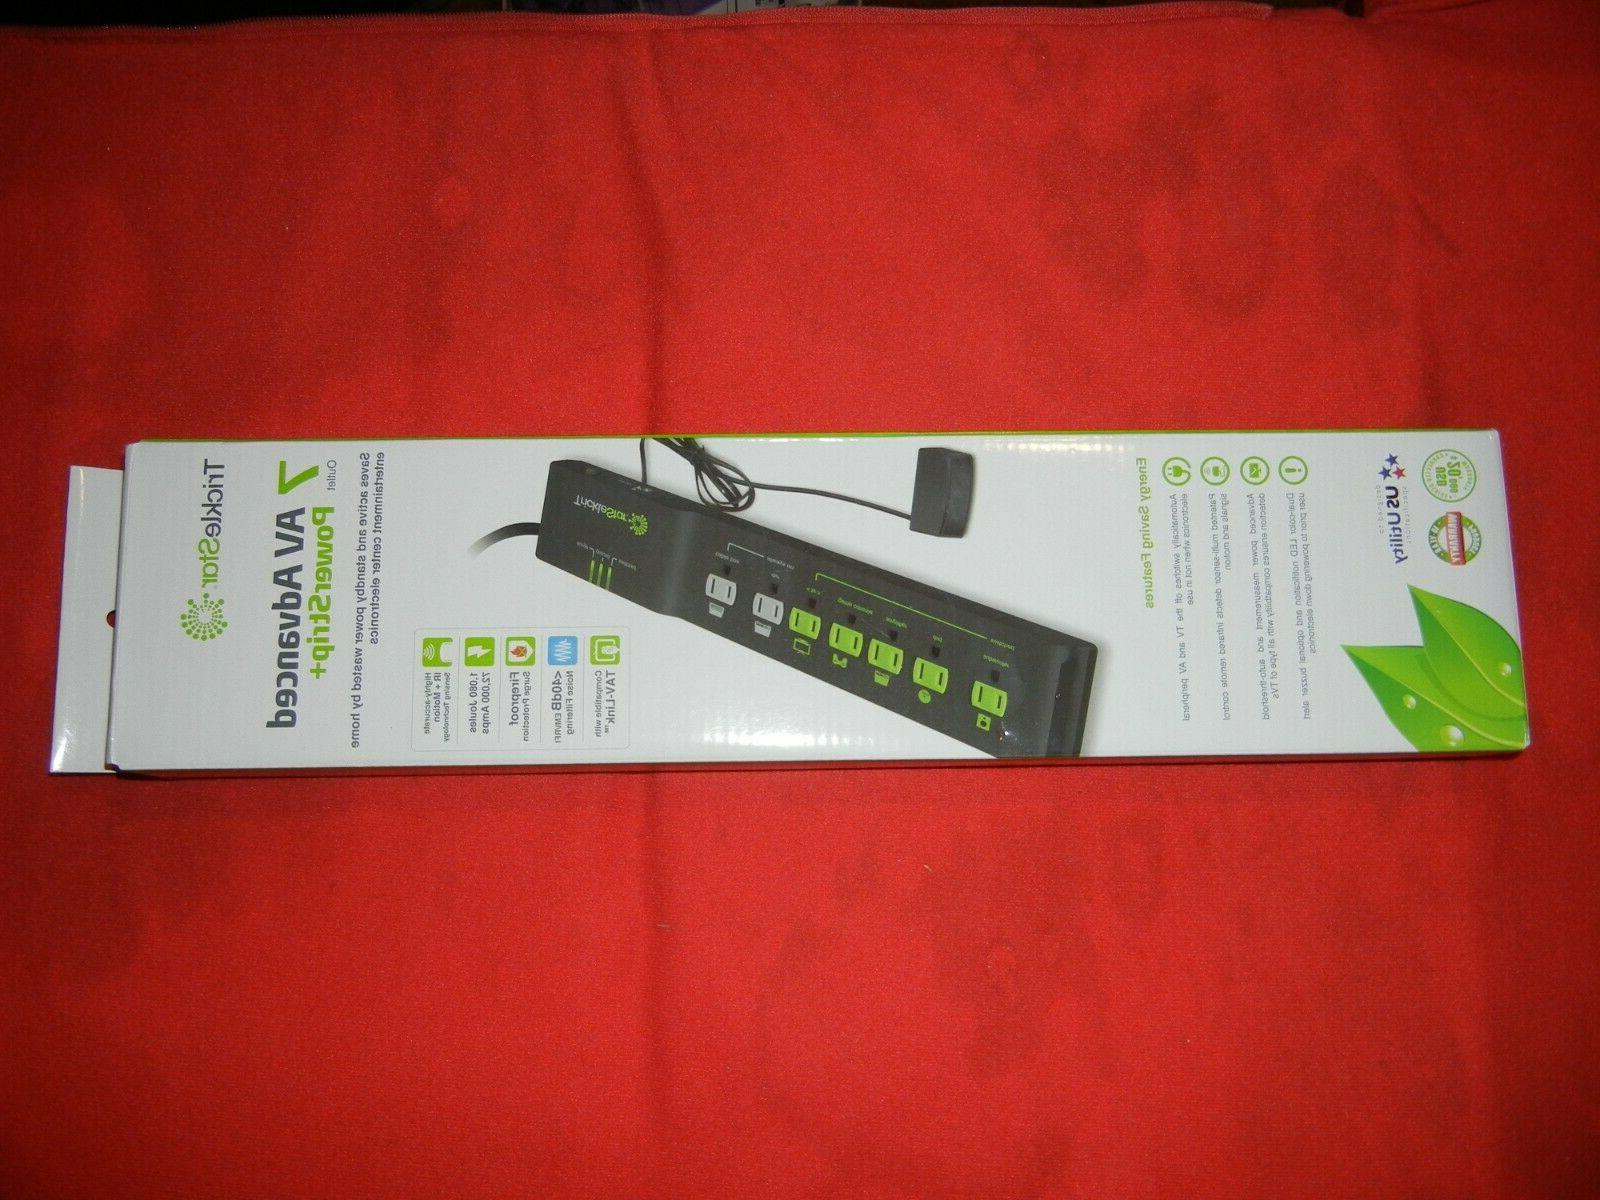 7 advanced outlet energy saving power strip